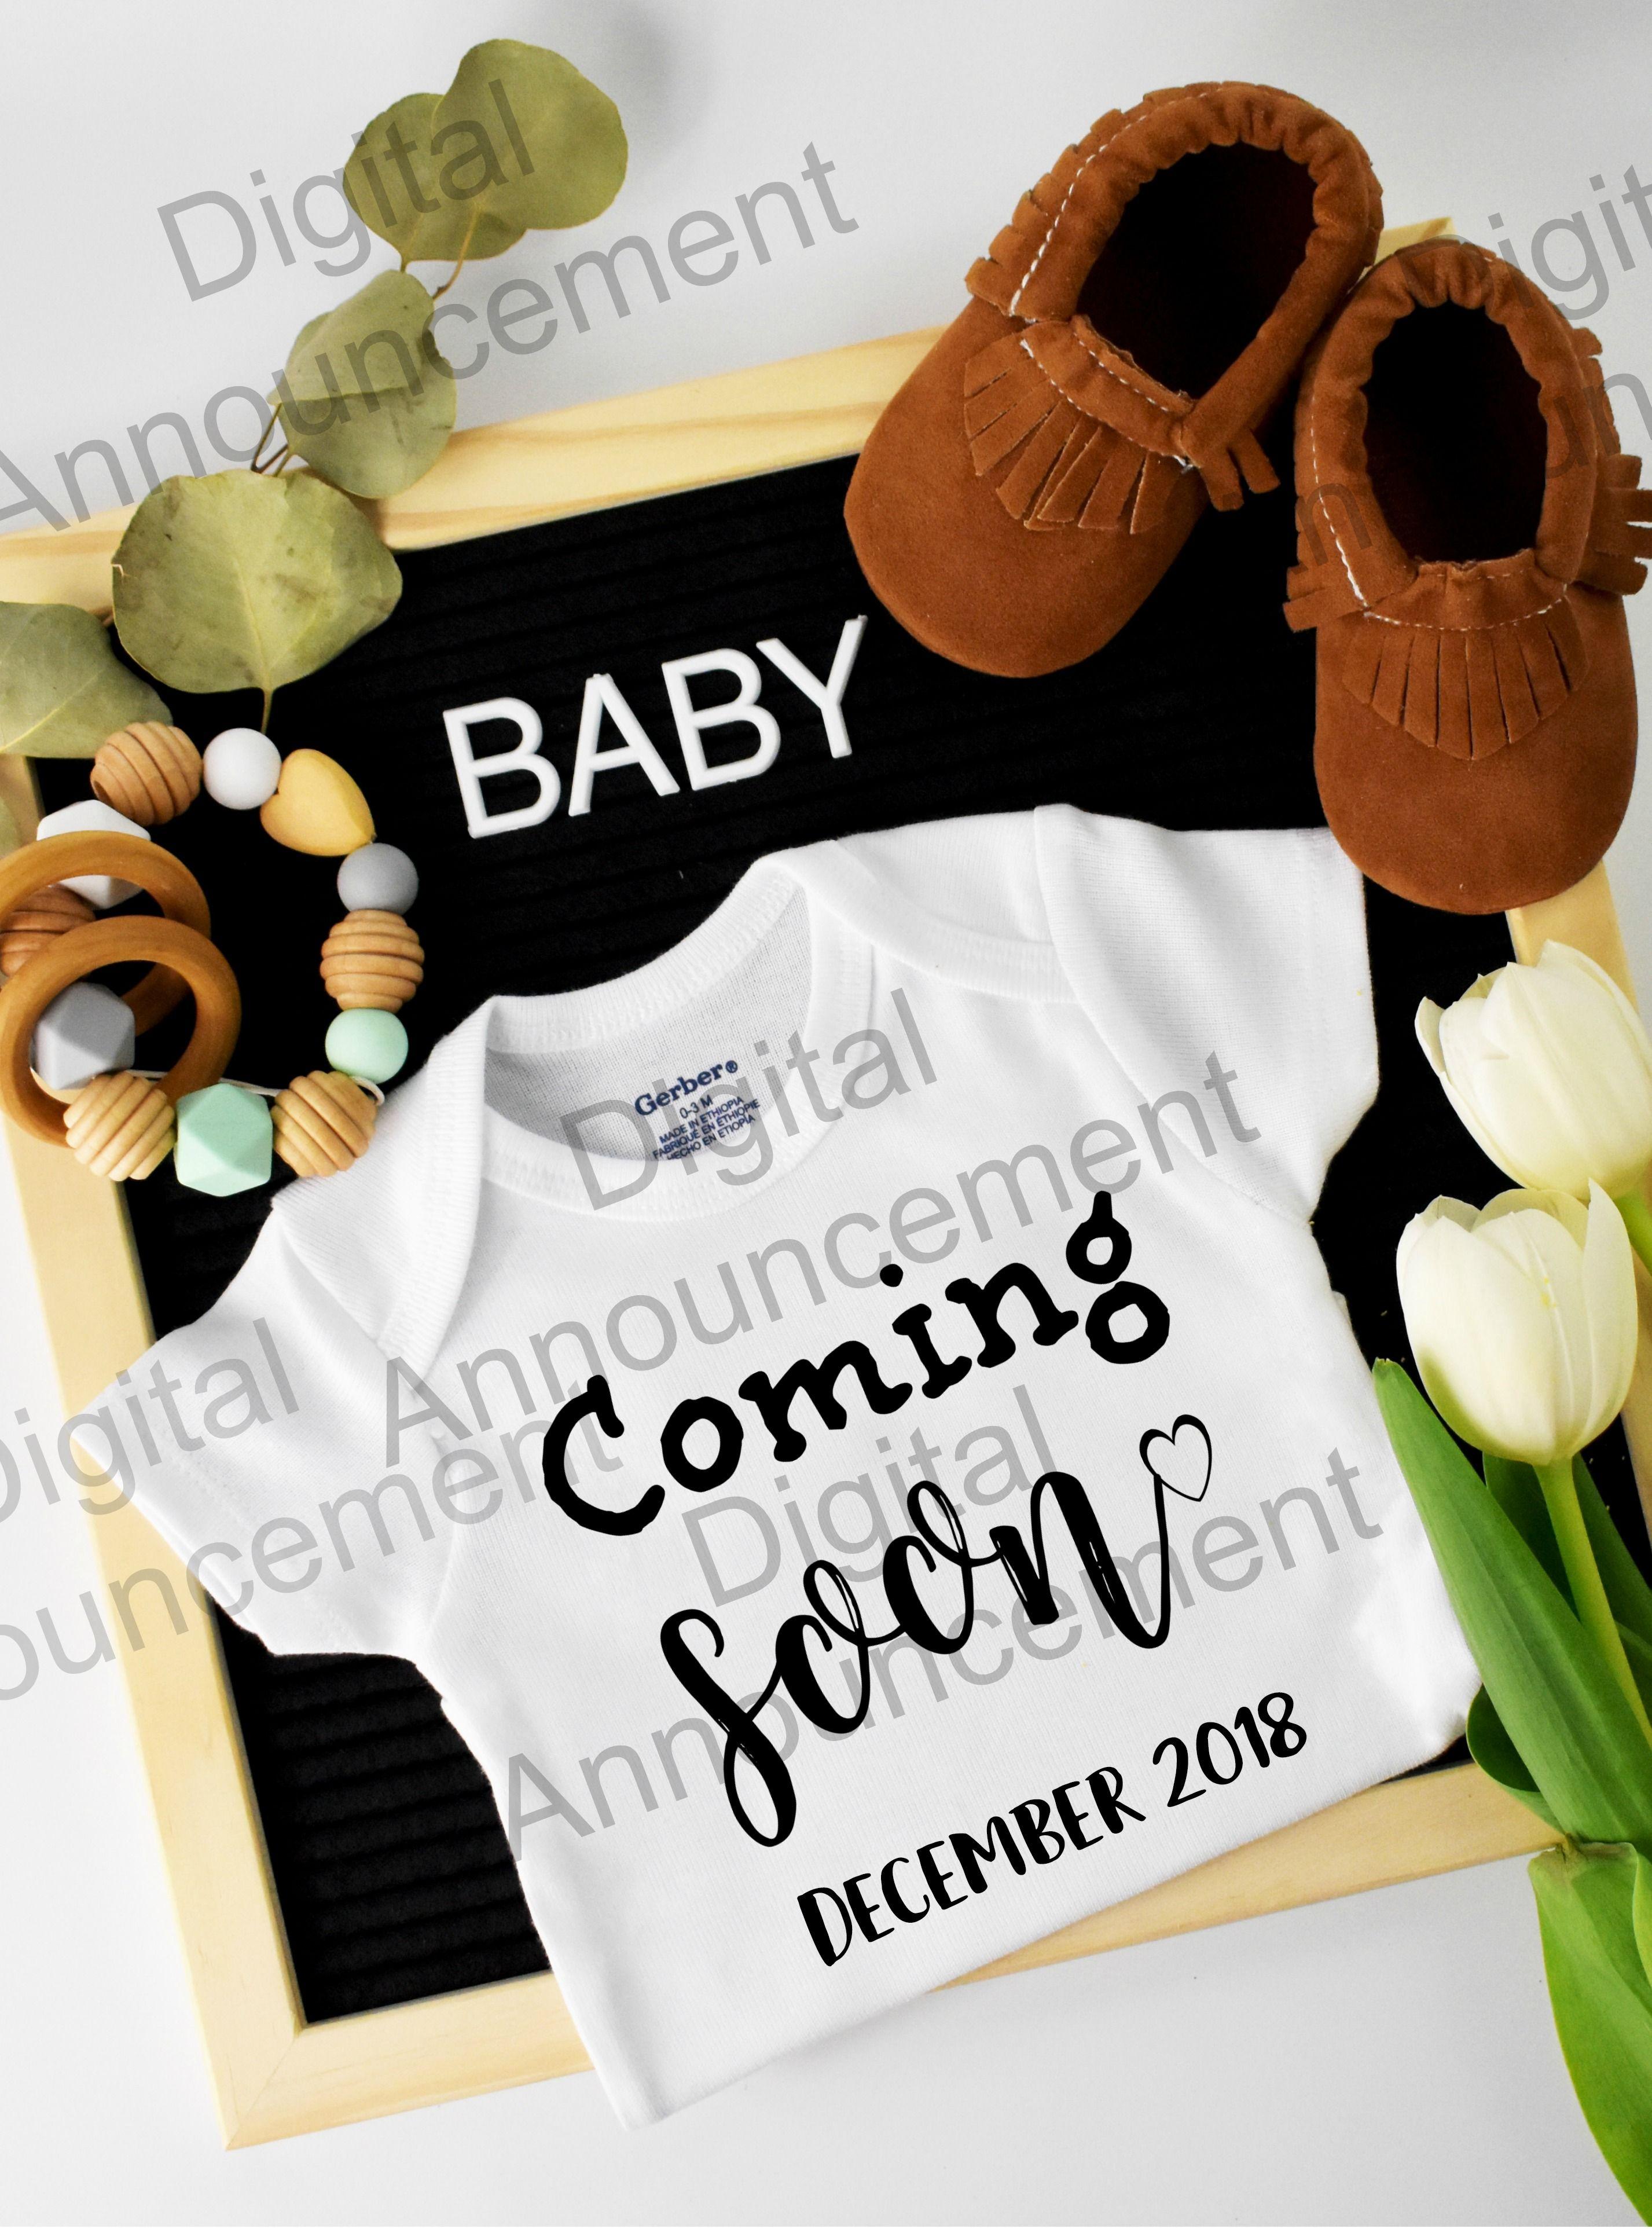 8ccc440b7 Digital Pregnancy Reveal for Social Media | Baby announcements ideas ...